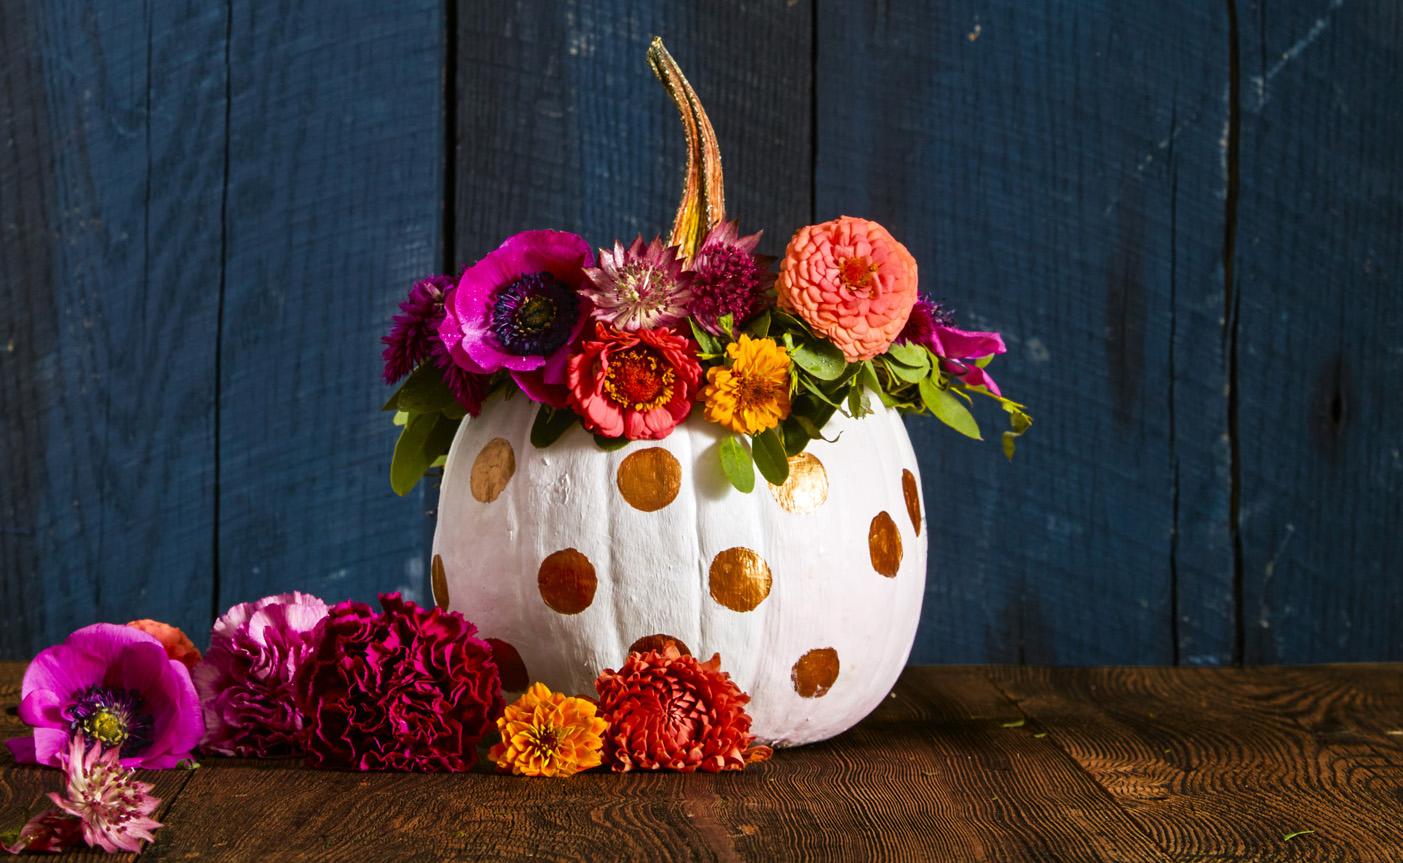 Pumpkin stems for crafts -  Pumpkin Stems For Crafts 13 Download